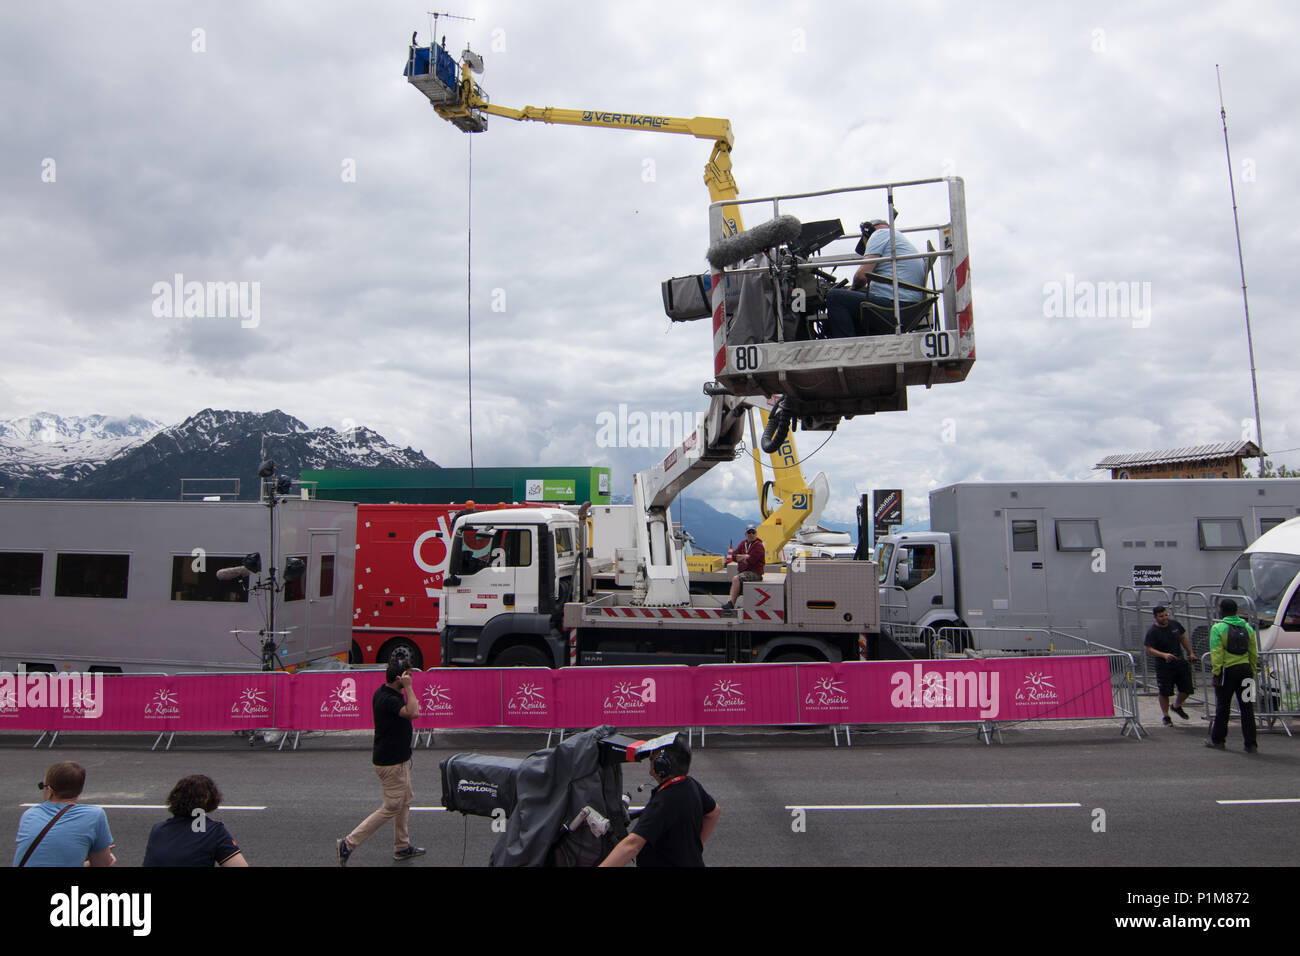 A cameraman on a platform crane filming the finish line at the Criterium du Dauphiné 2018 Stage 6 La Rosière Avergne Rhone Alpes Savoie Stock Photo